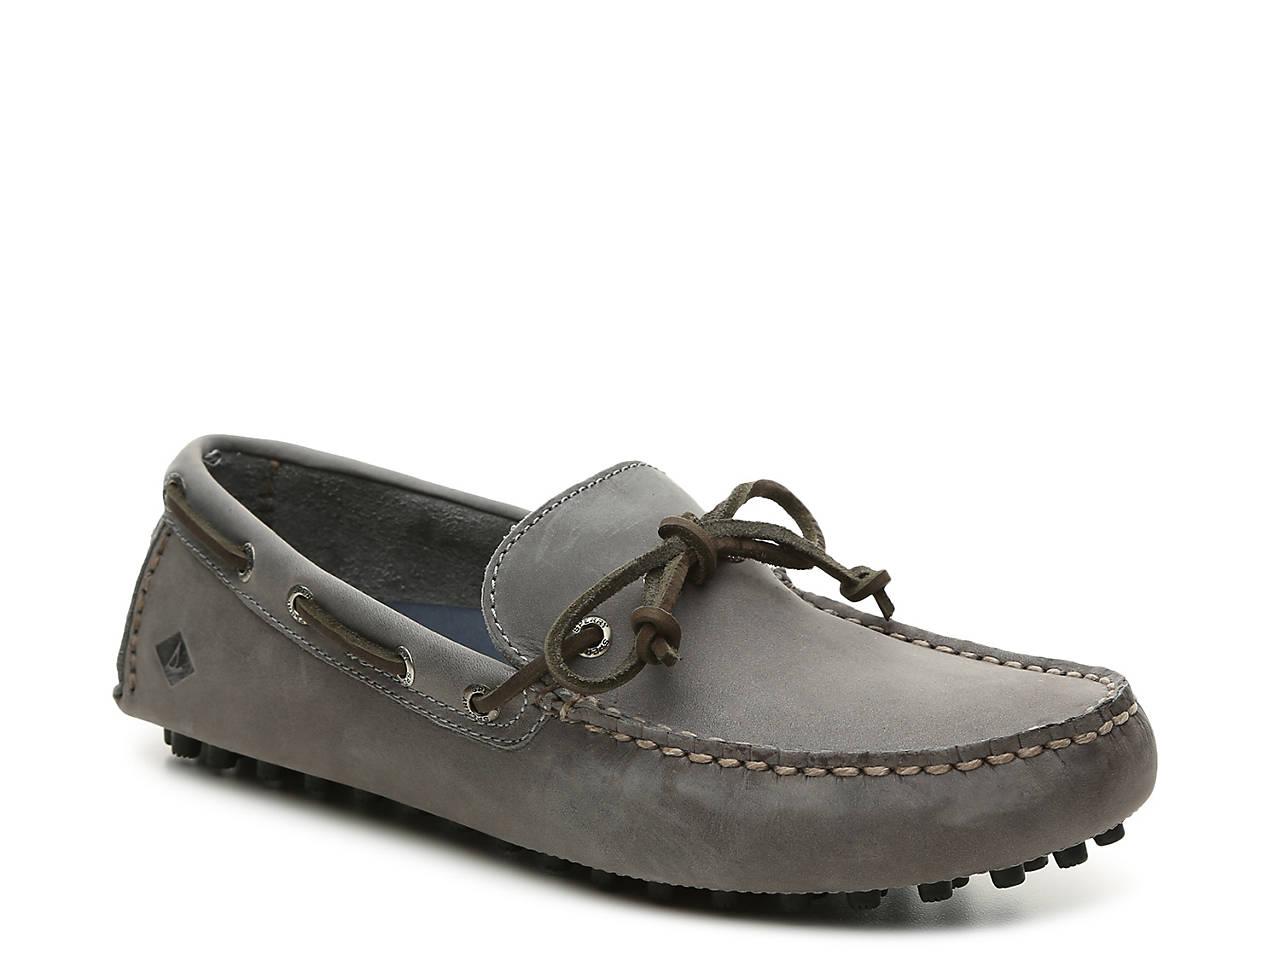 100% Guaranteed Sale Online 2018 Unisex Sale Online Sperry Suede Round-Toe Loafers Clearance Footlocker Finishline gjR0geG32D